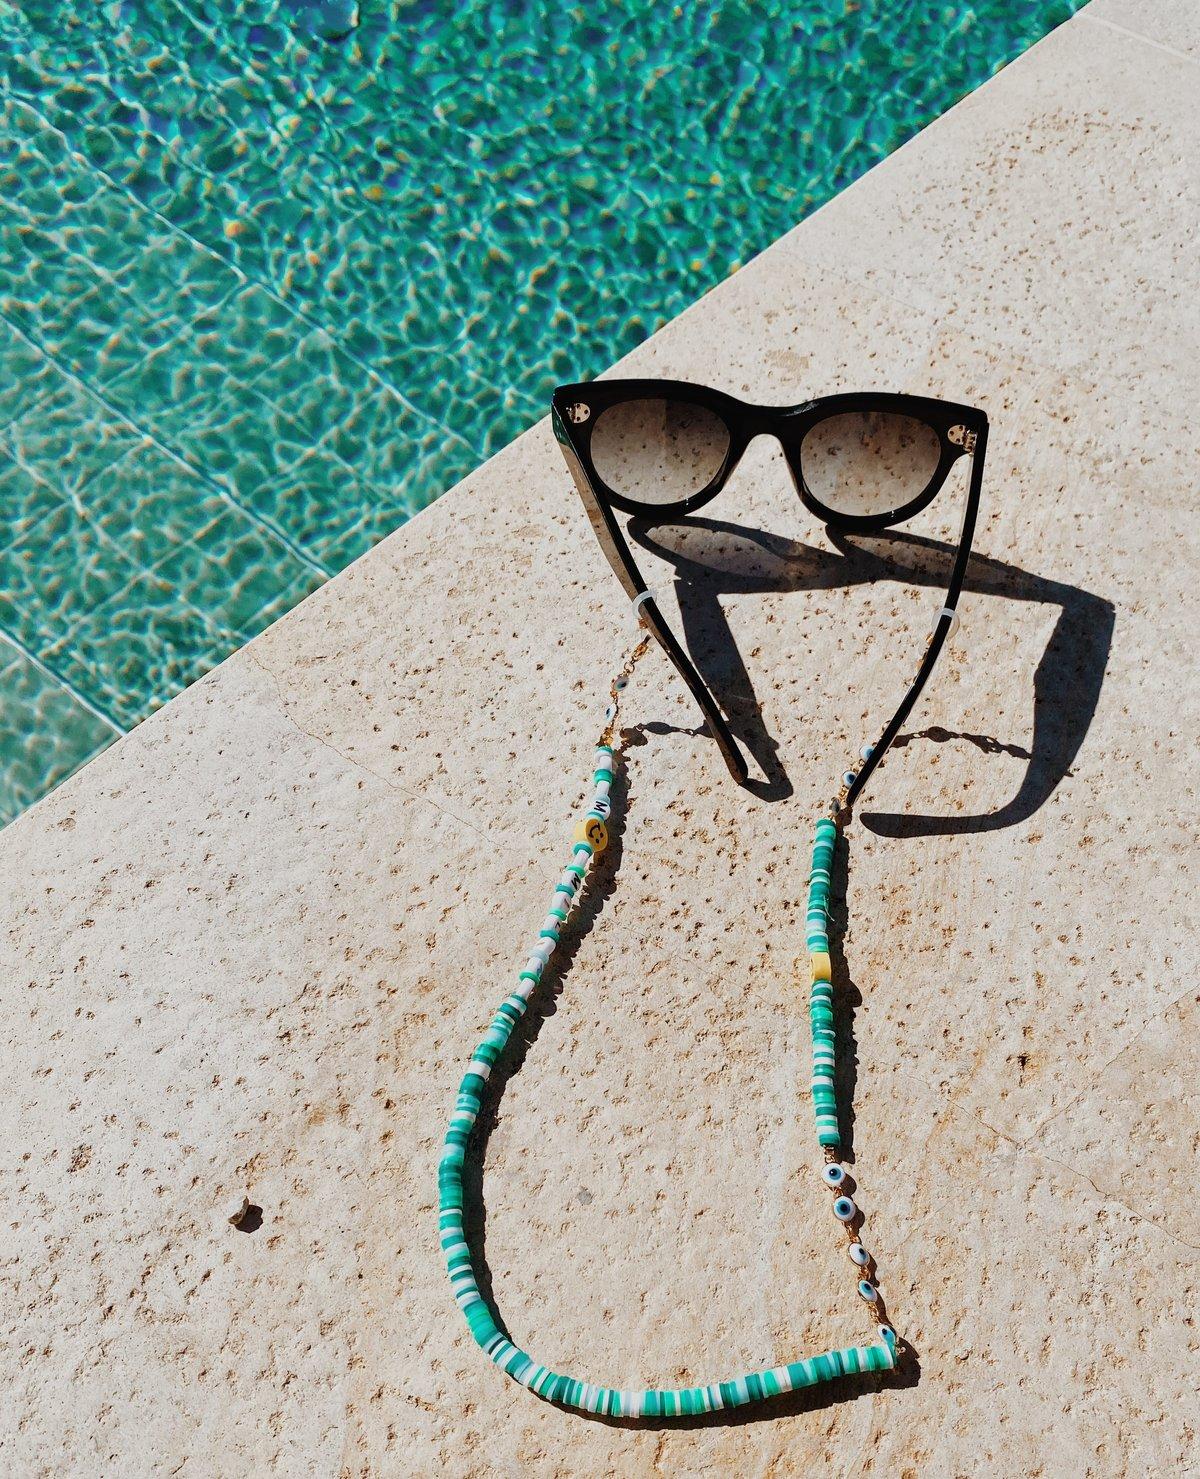 Image of Porte lunettes